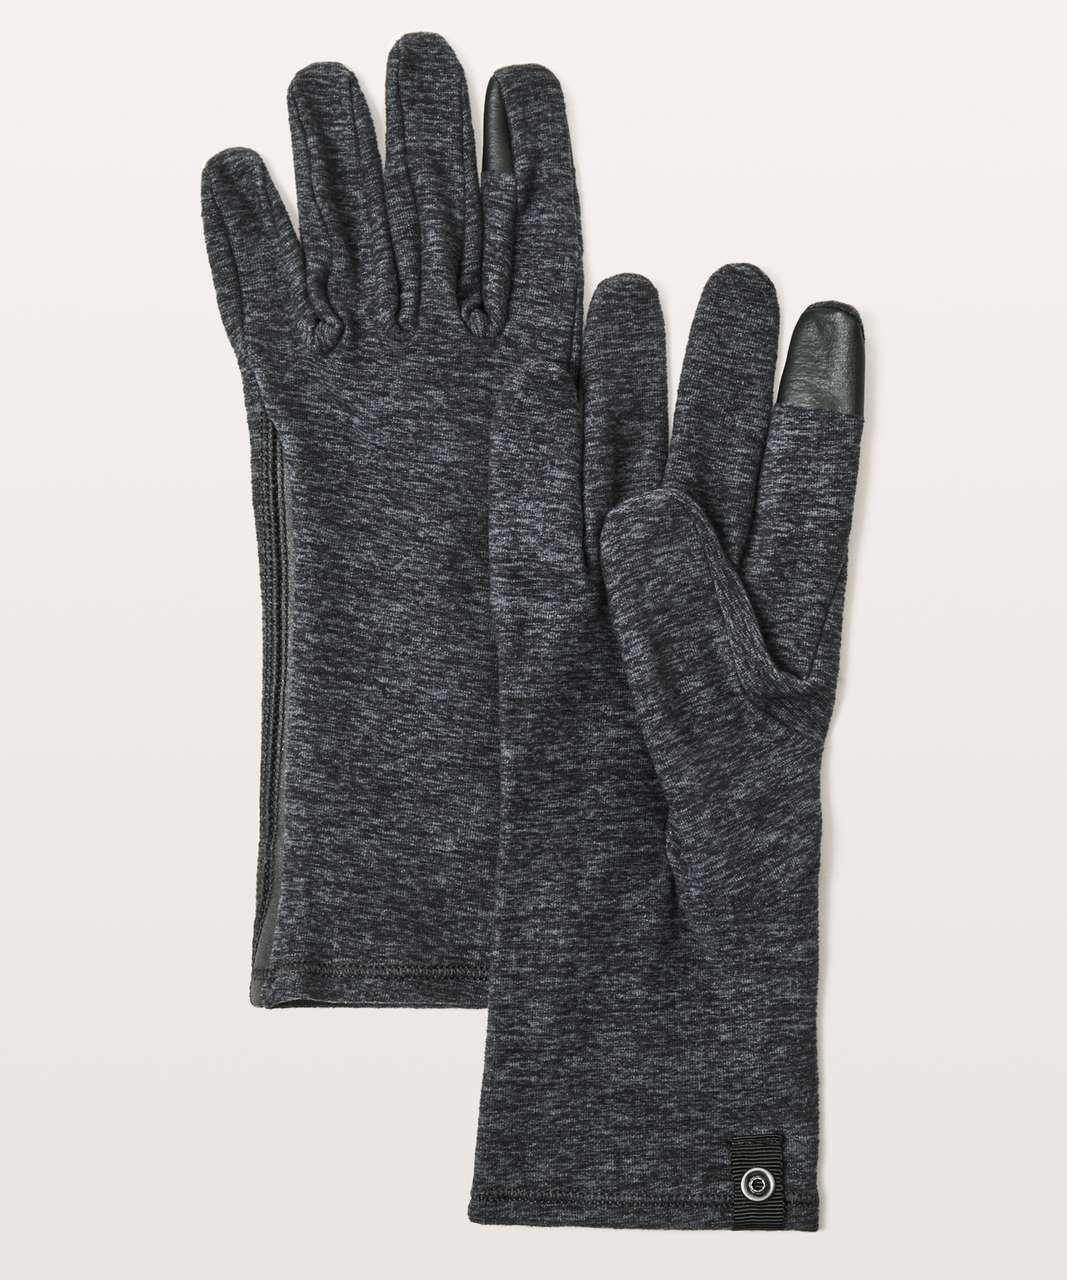 Lululemon Run It Out Gloves - Heathered Dark Cast / Black